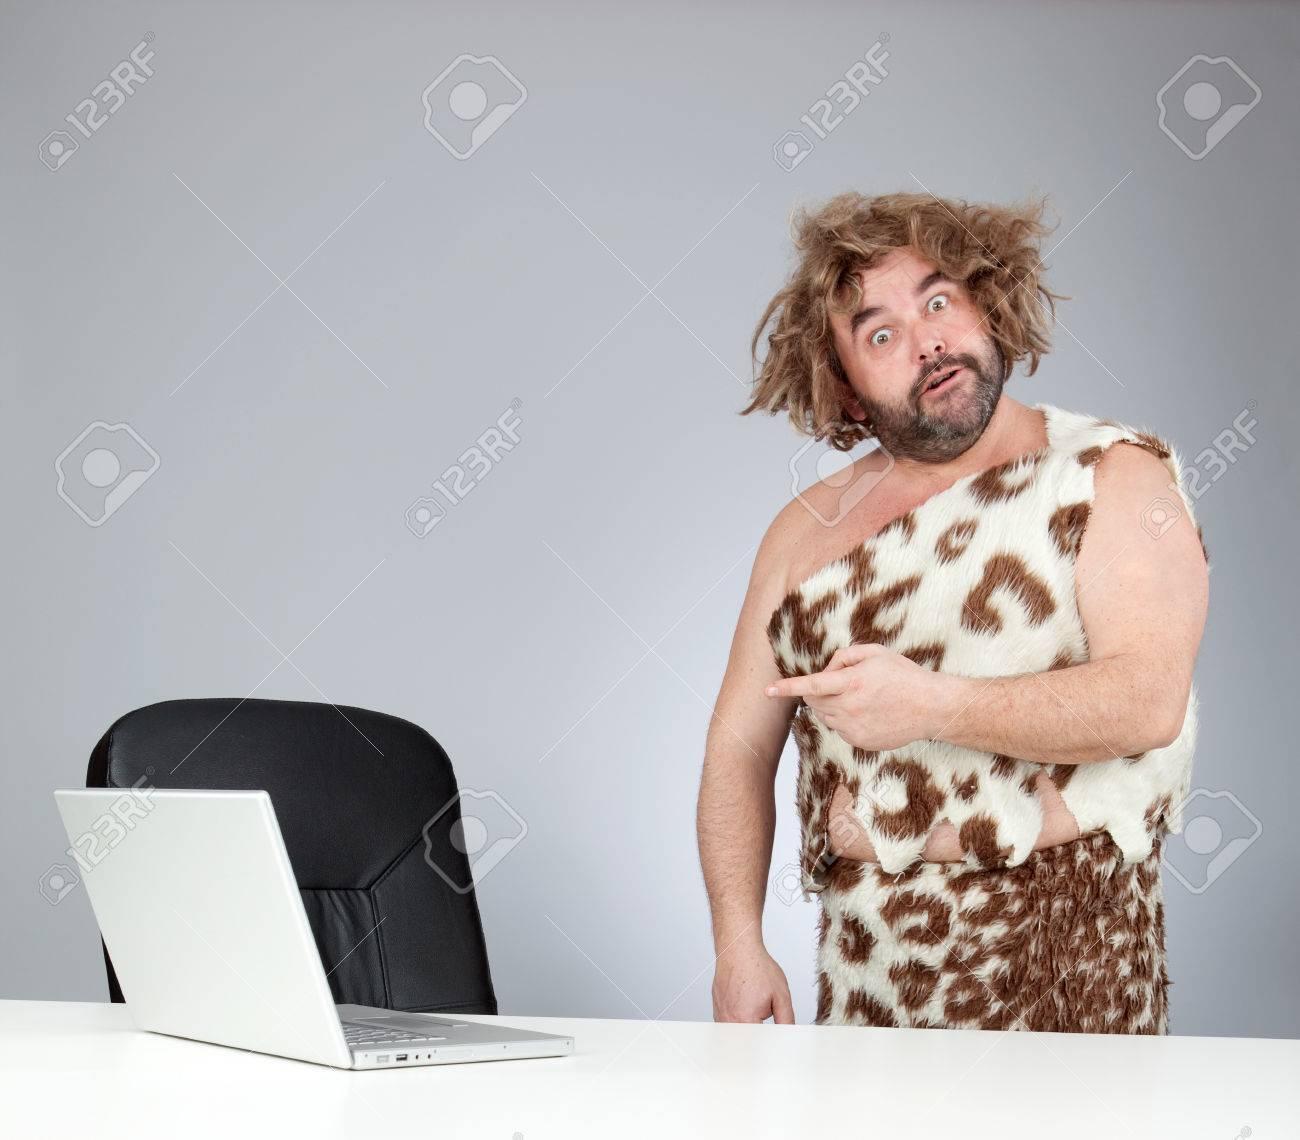 funny perplex prehistoric man using laptop - 57921516